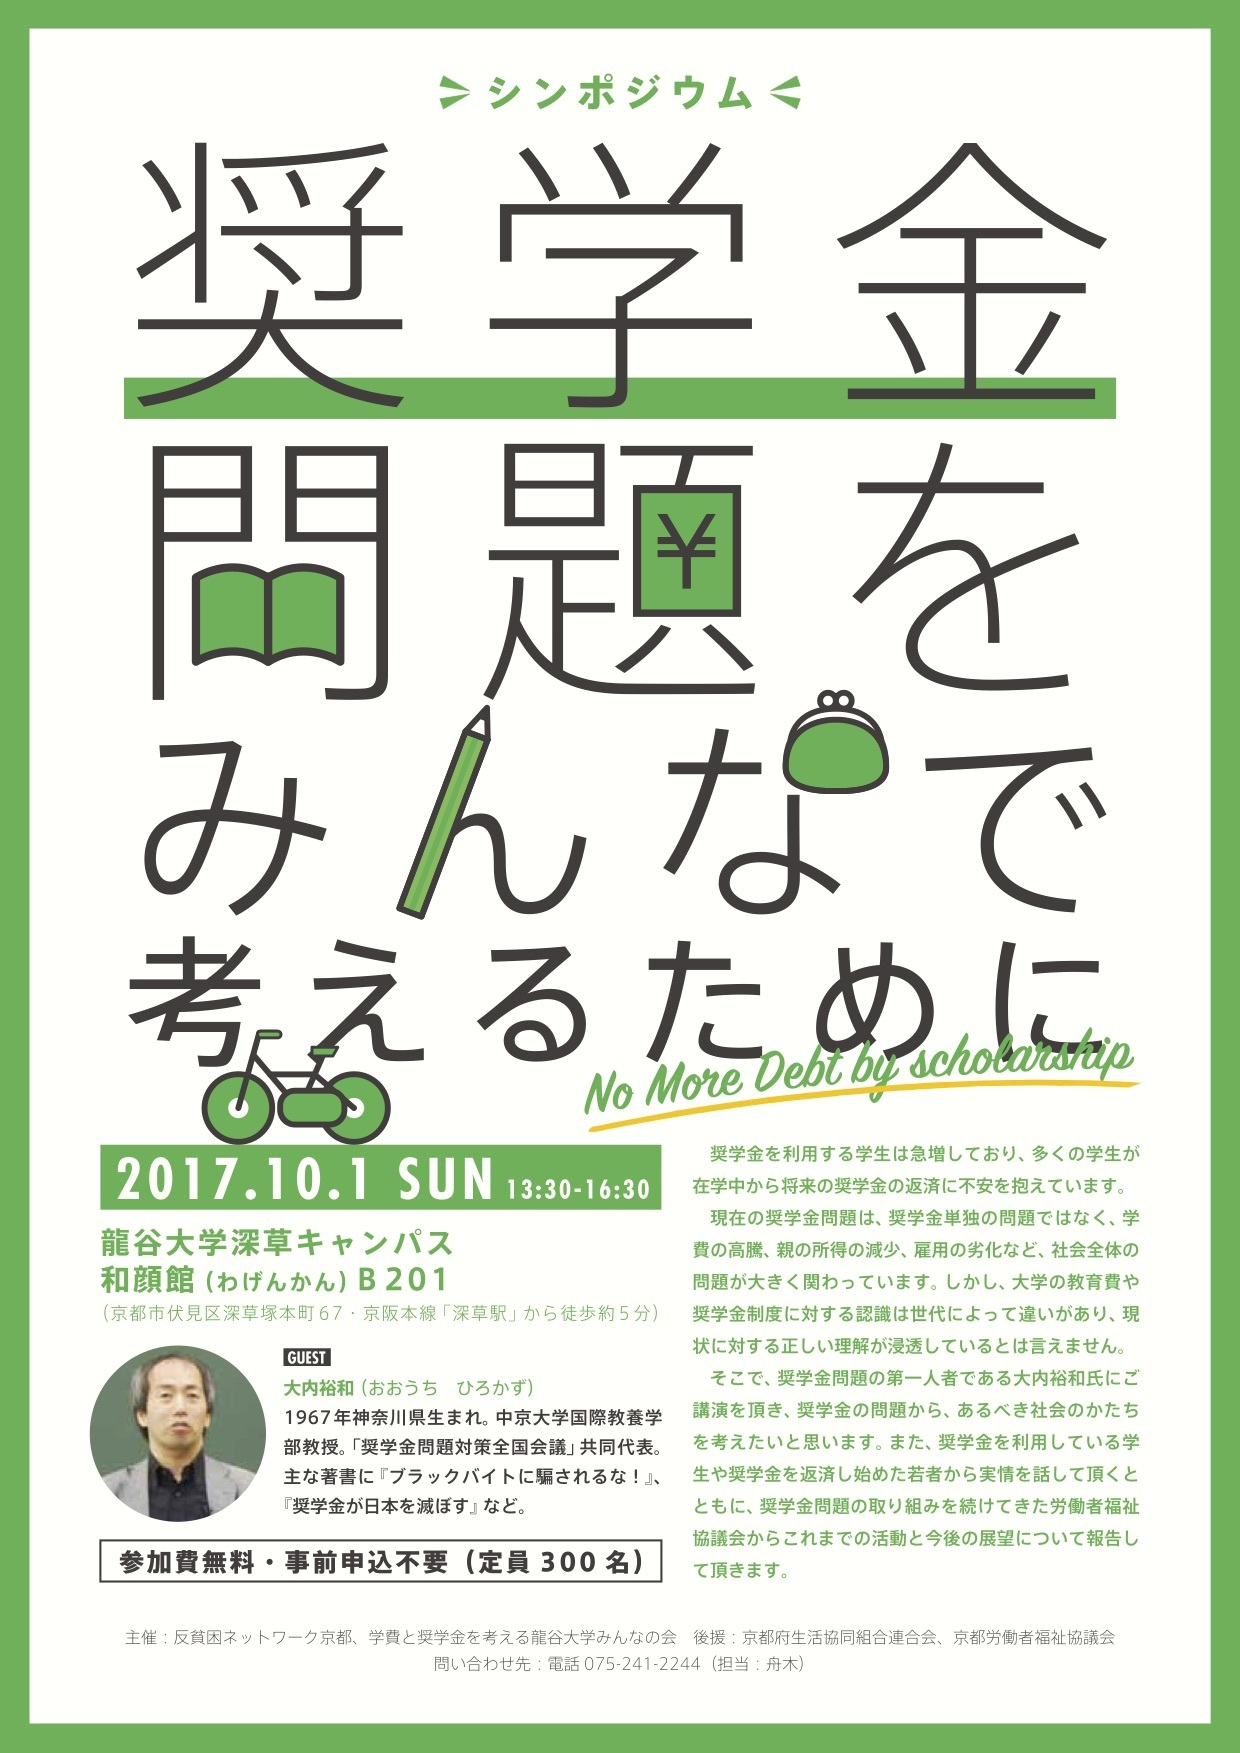 SYOGAKUKIN_Symposium_chirashi_02.jpg